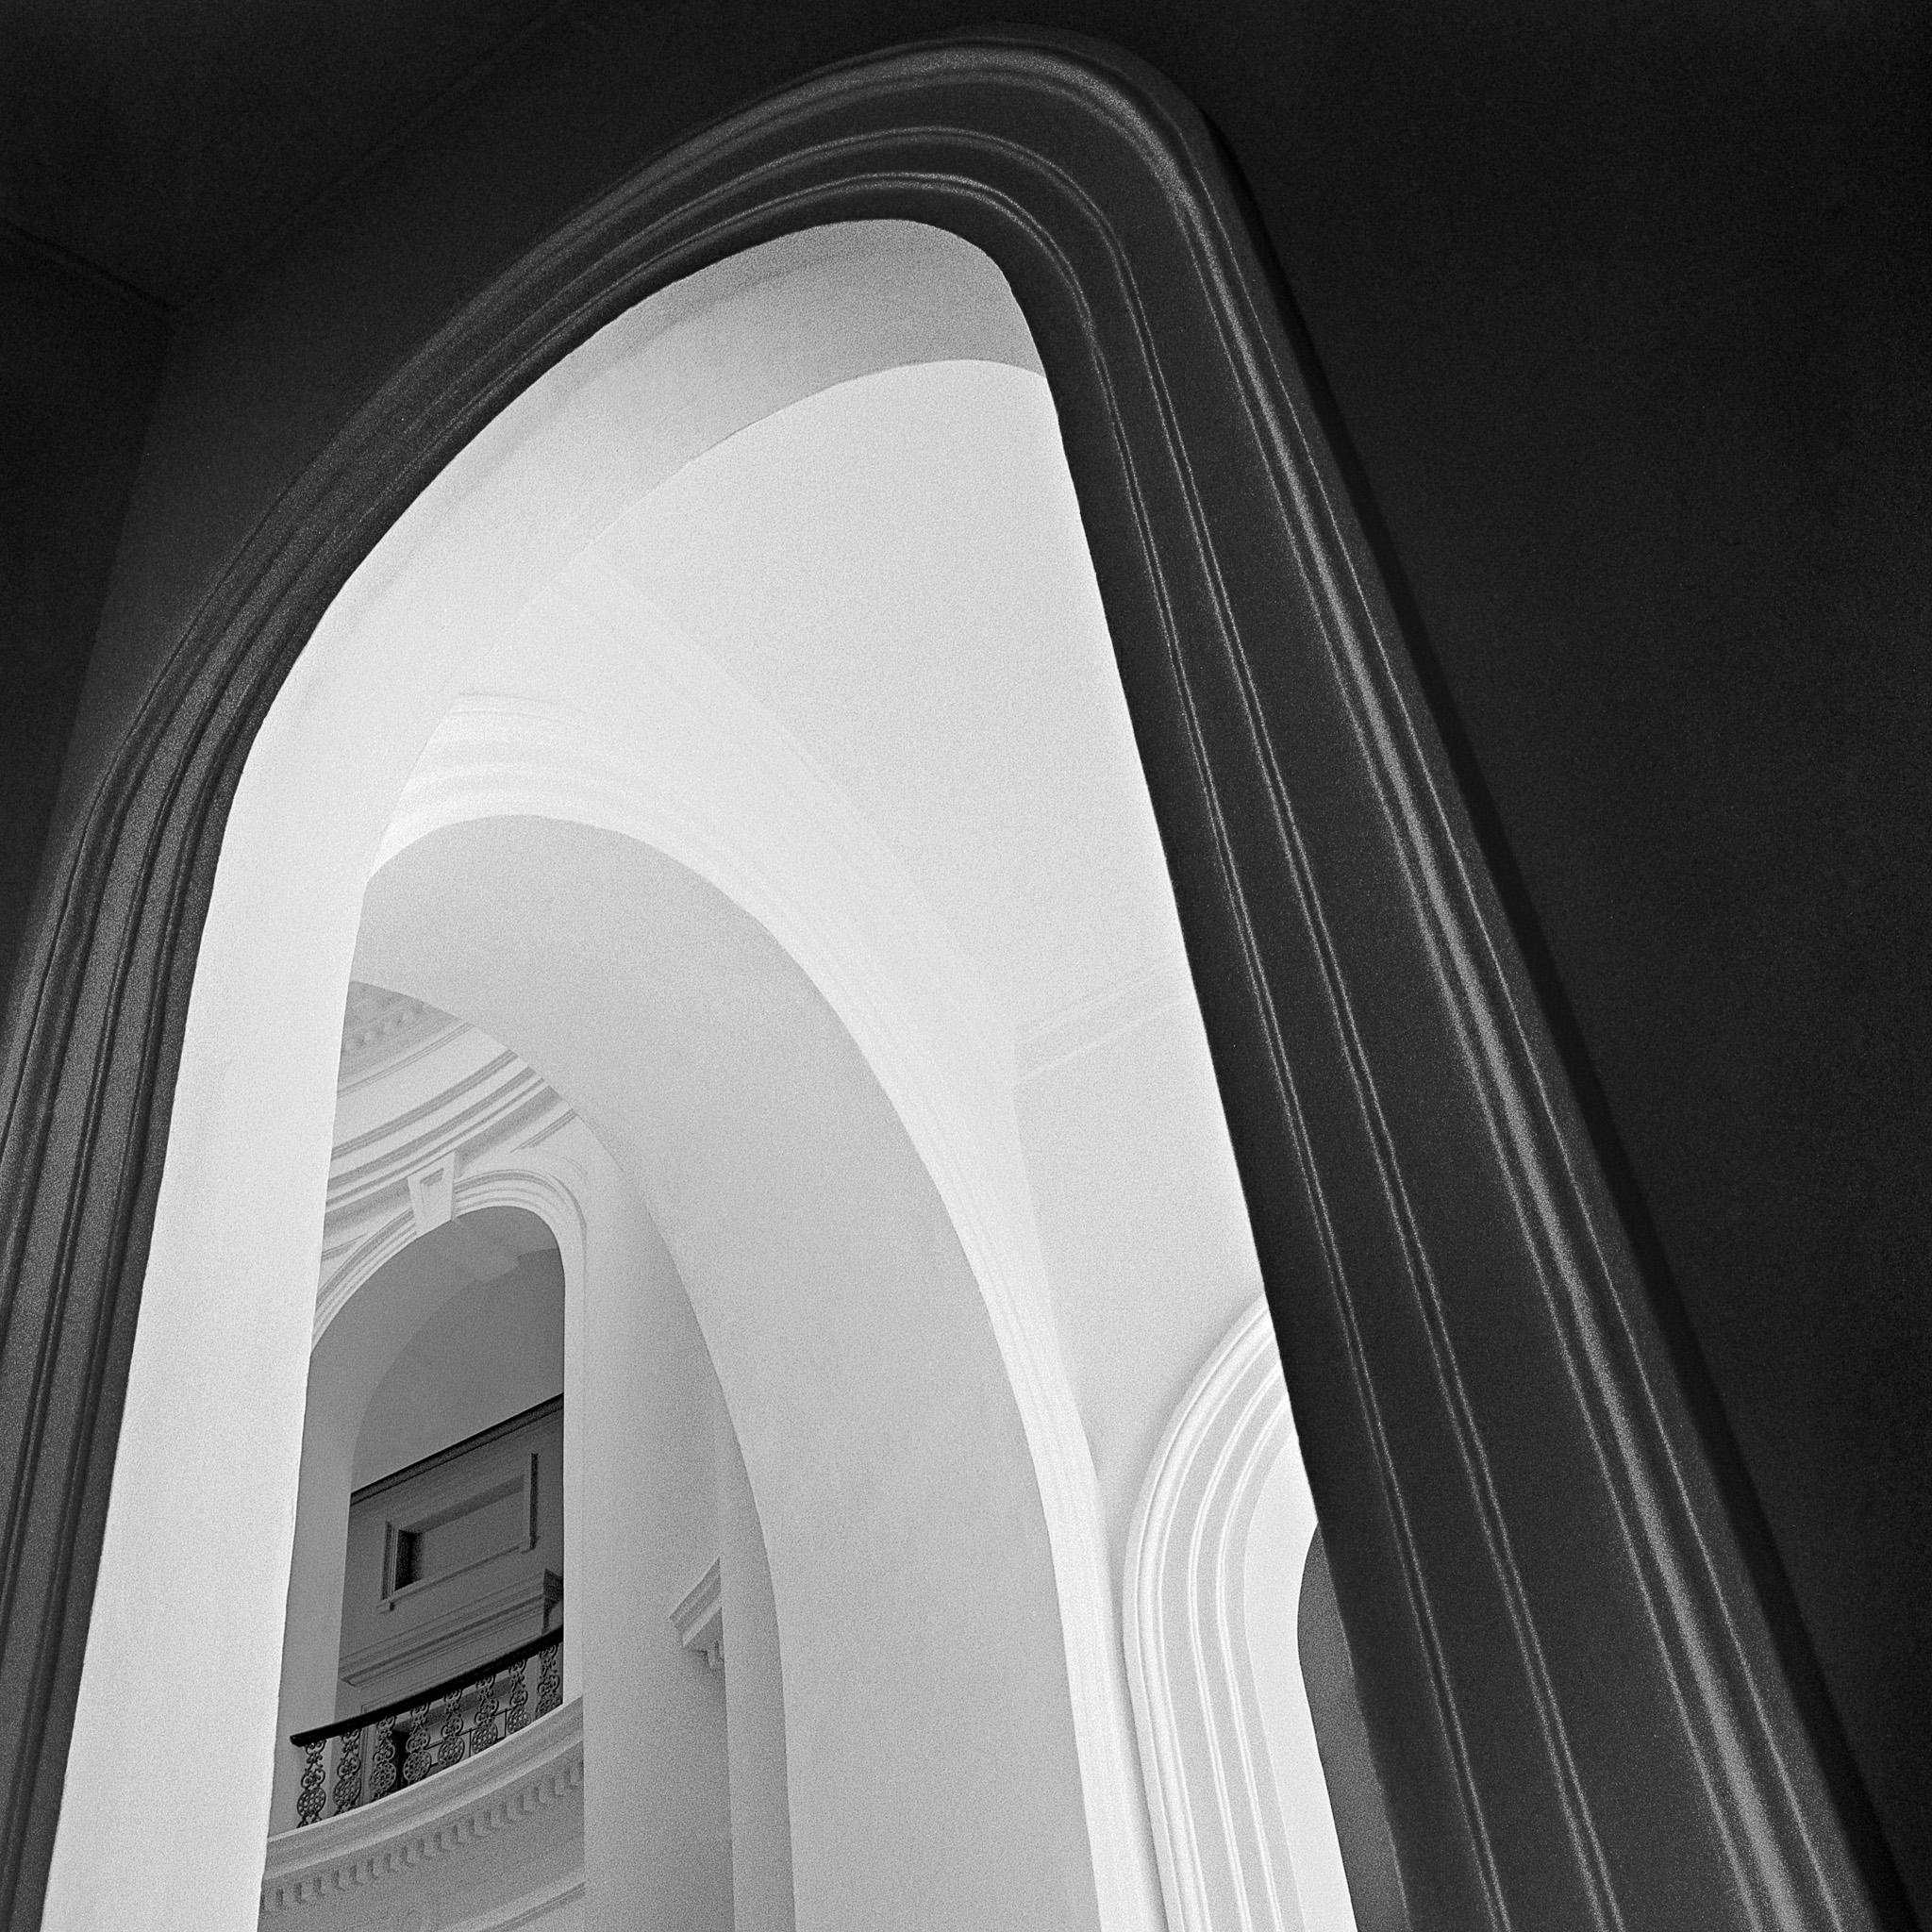 Stamford II, by Tham Jing Wen